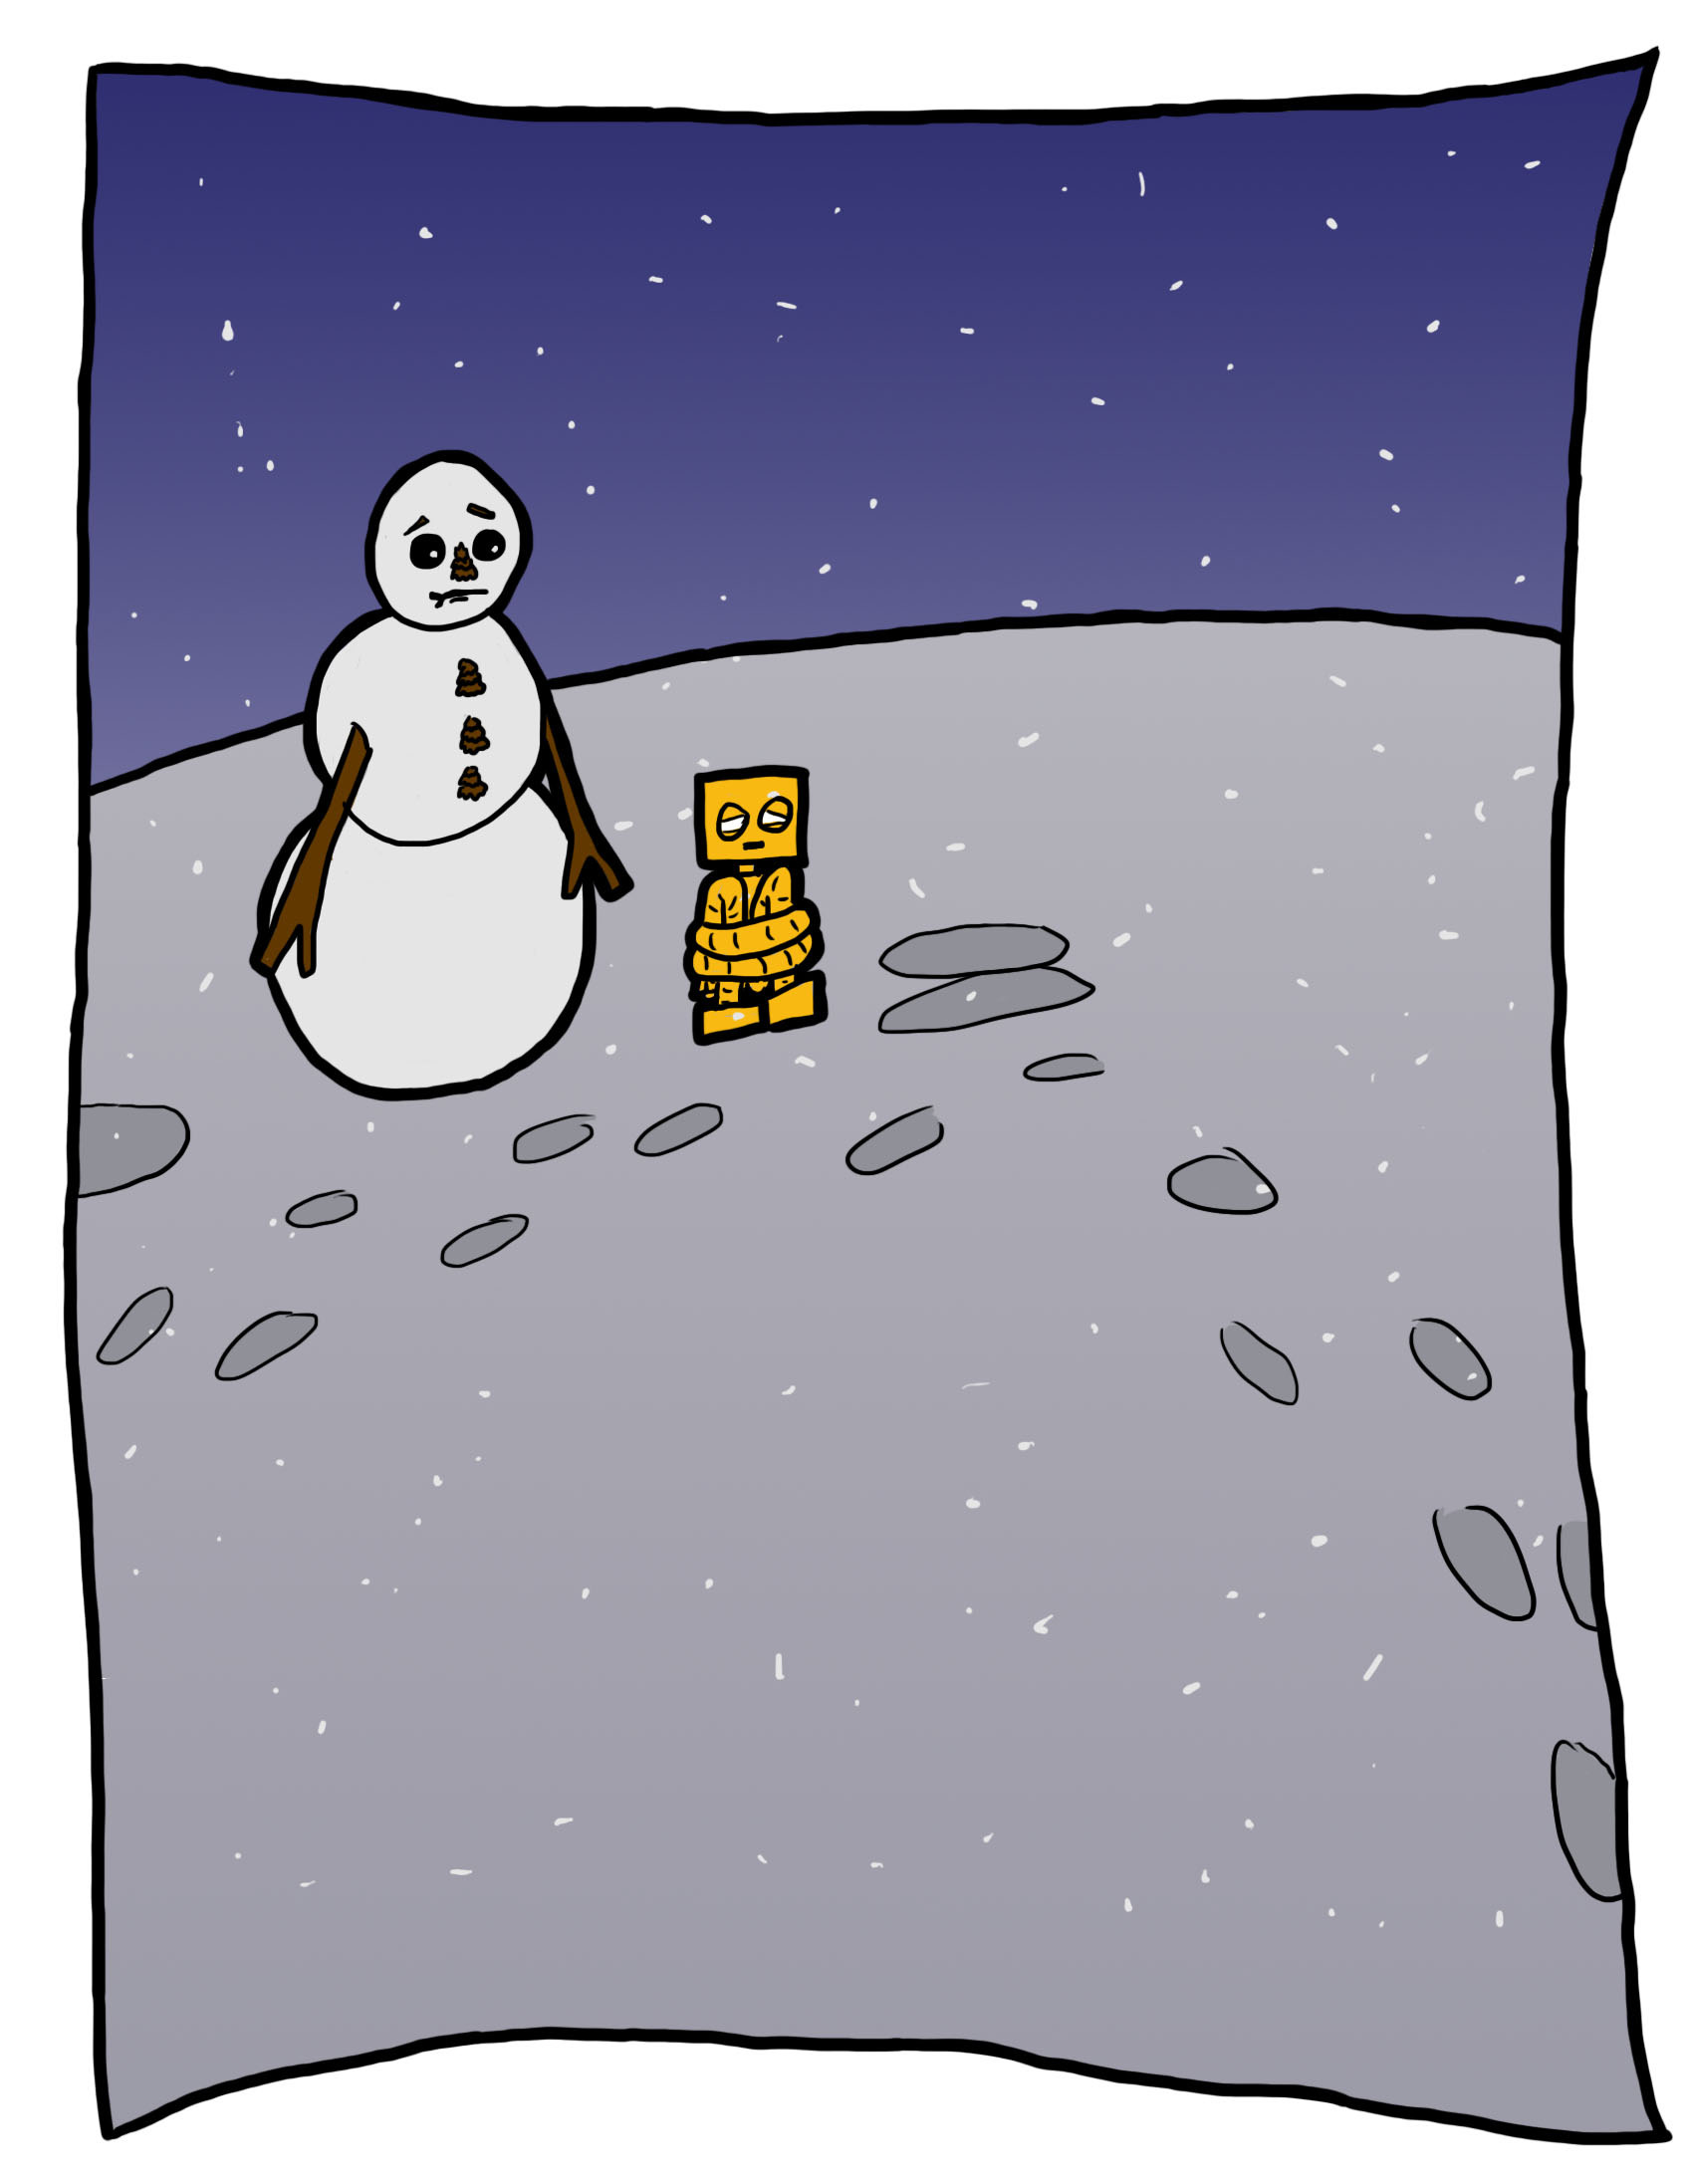 Every Snowman Dies 9